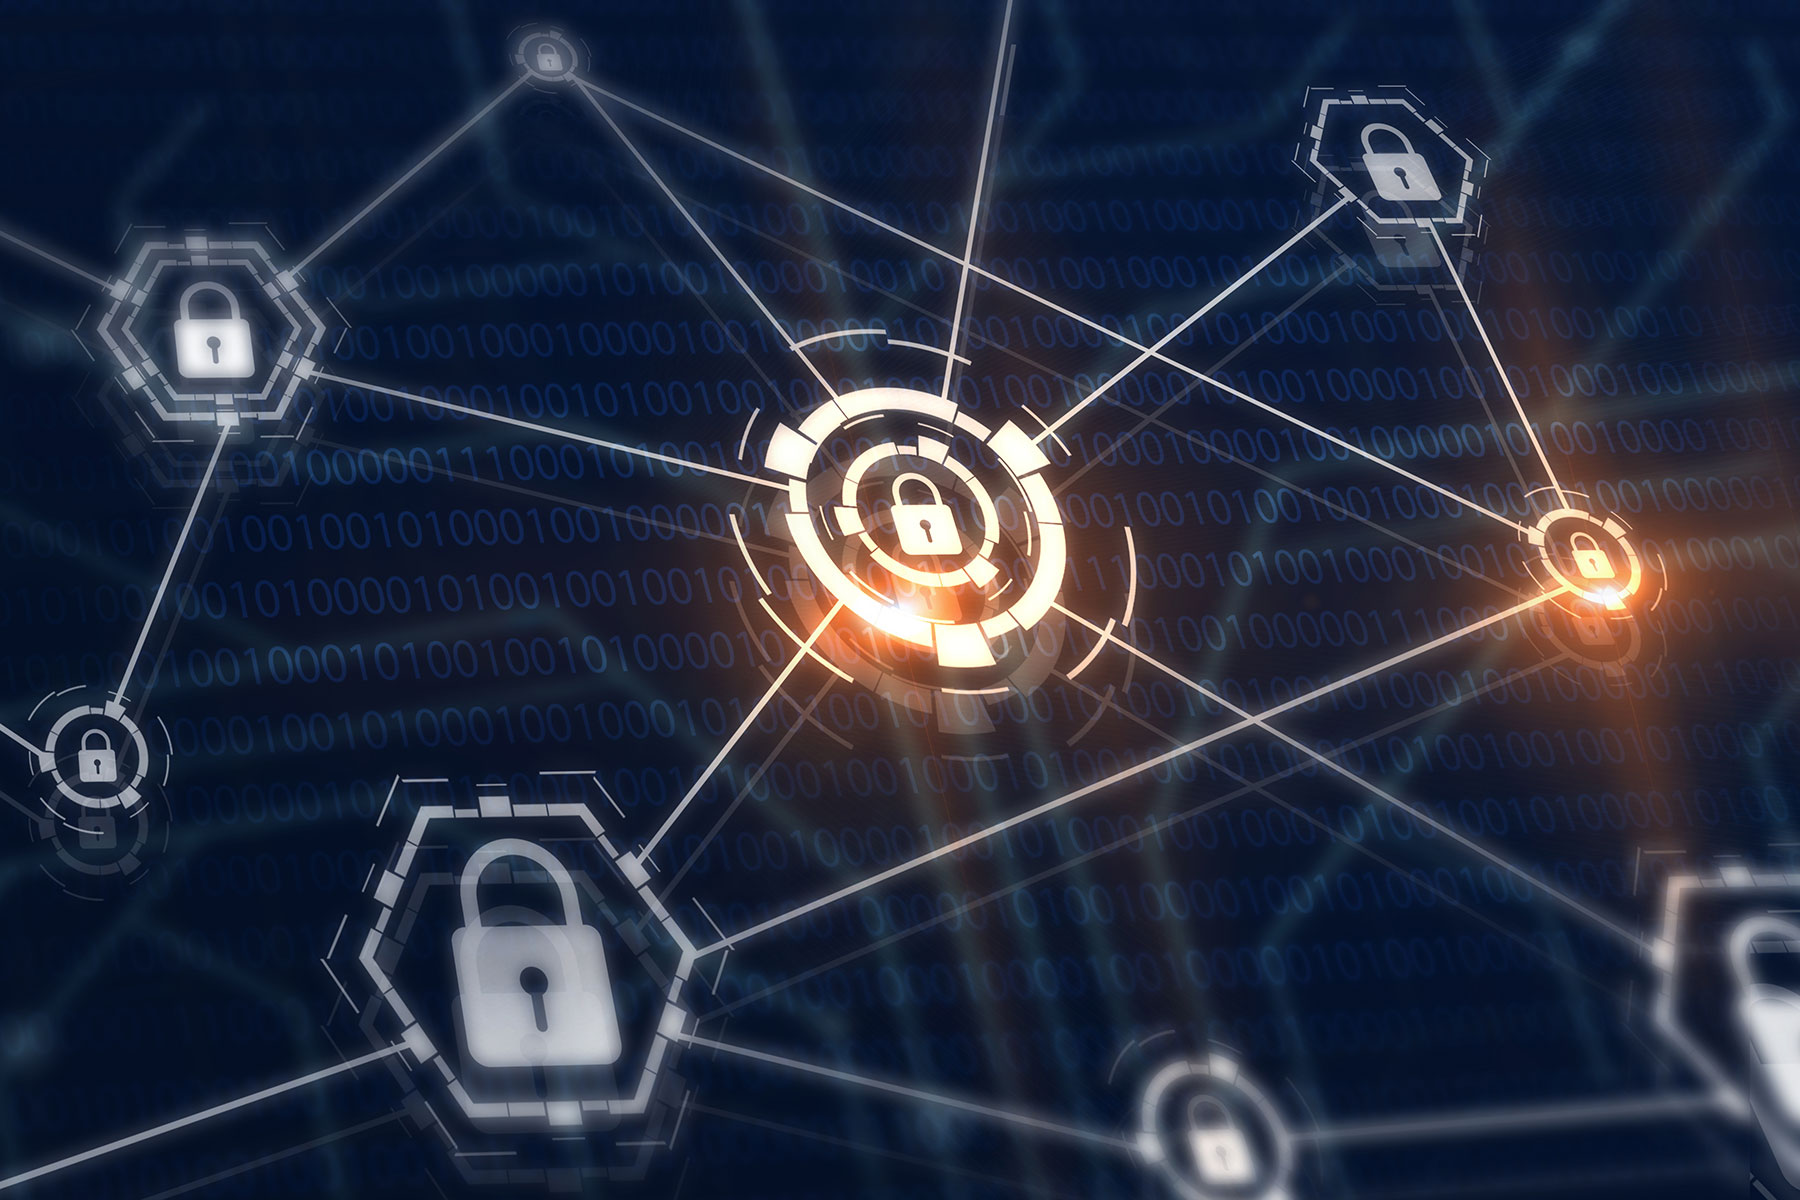 Addressing Visitors' Data Security Concerns in 4 Easy Steps